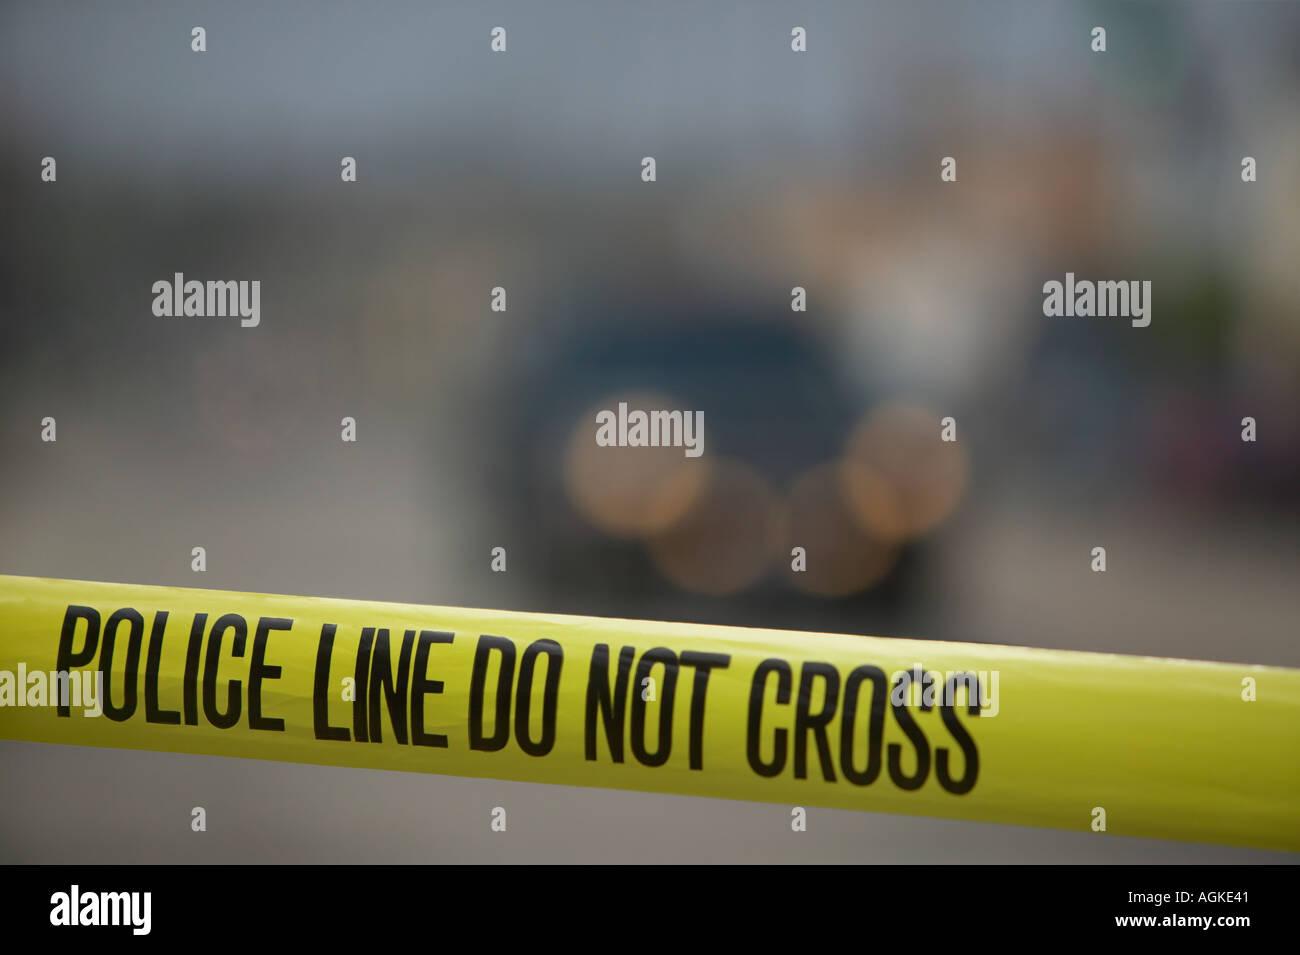 Police line tape blocking urban street - Stock Image